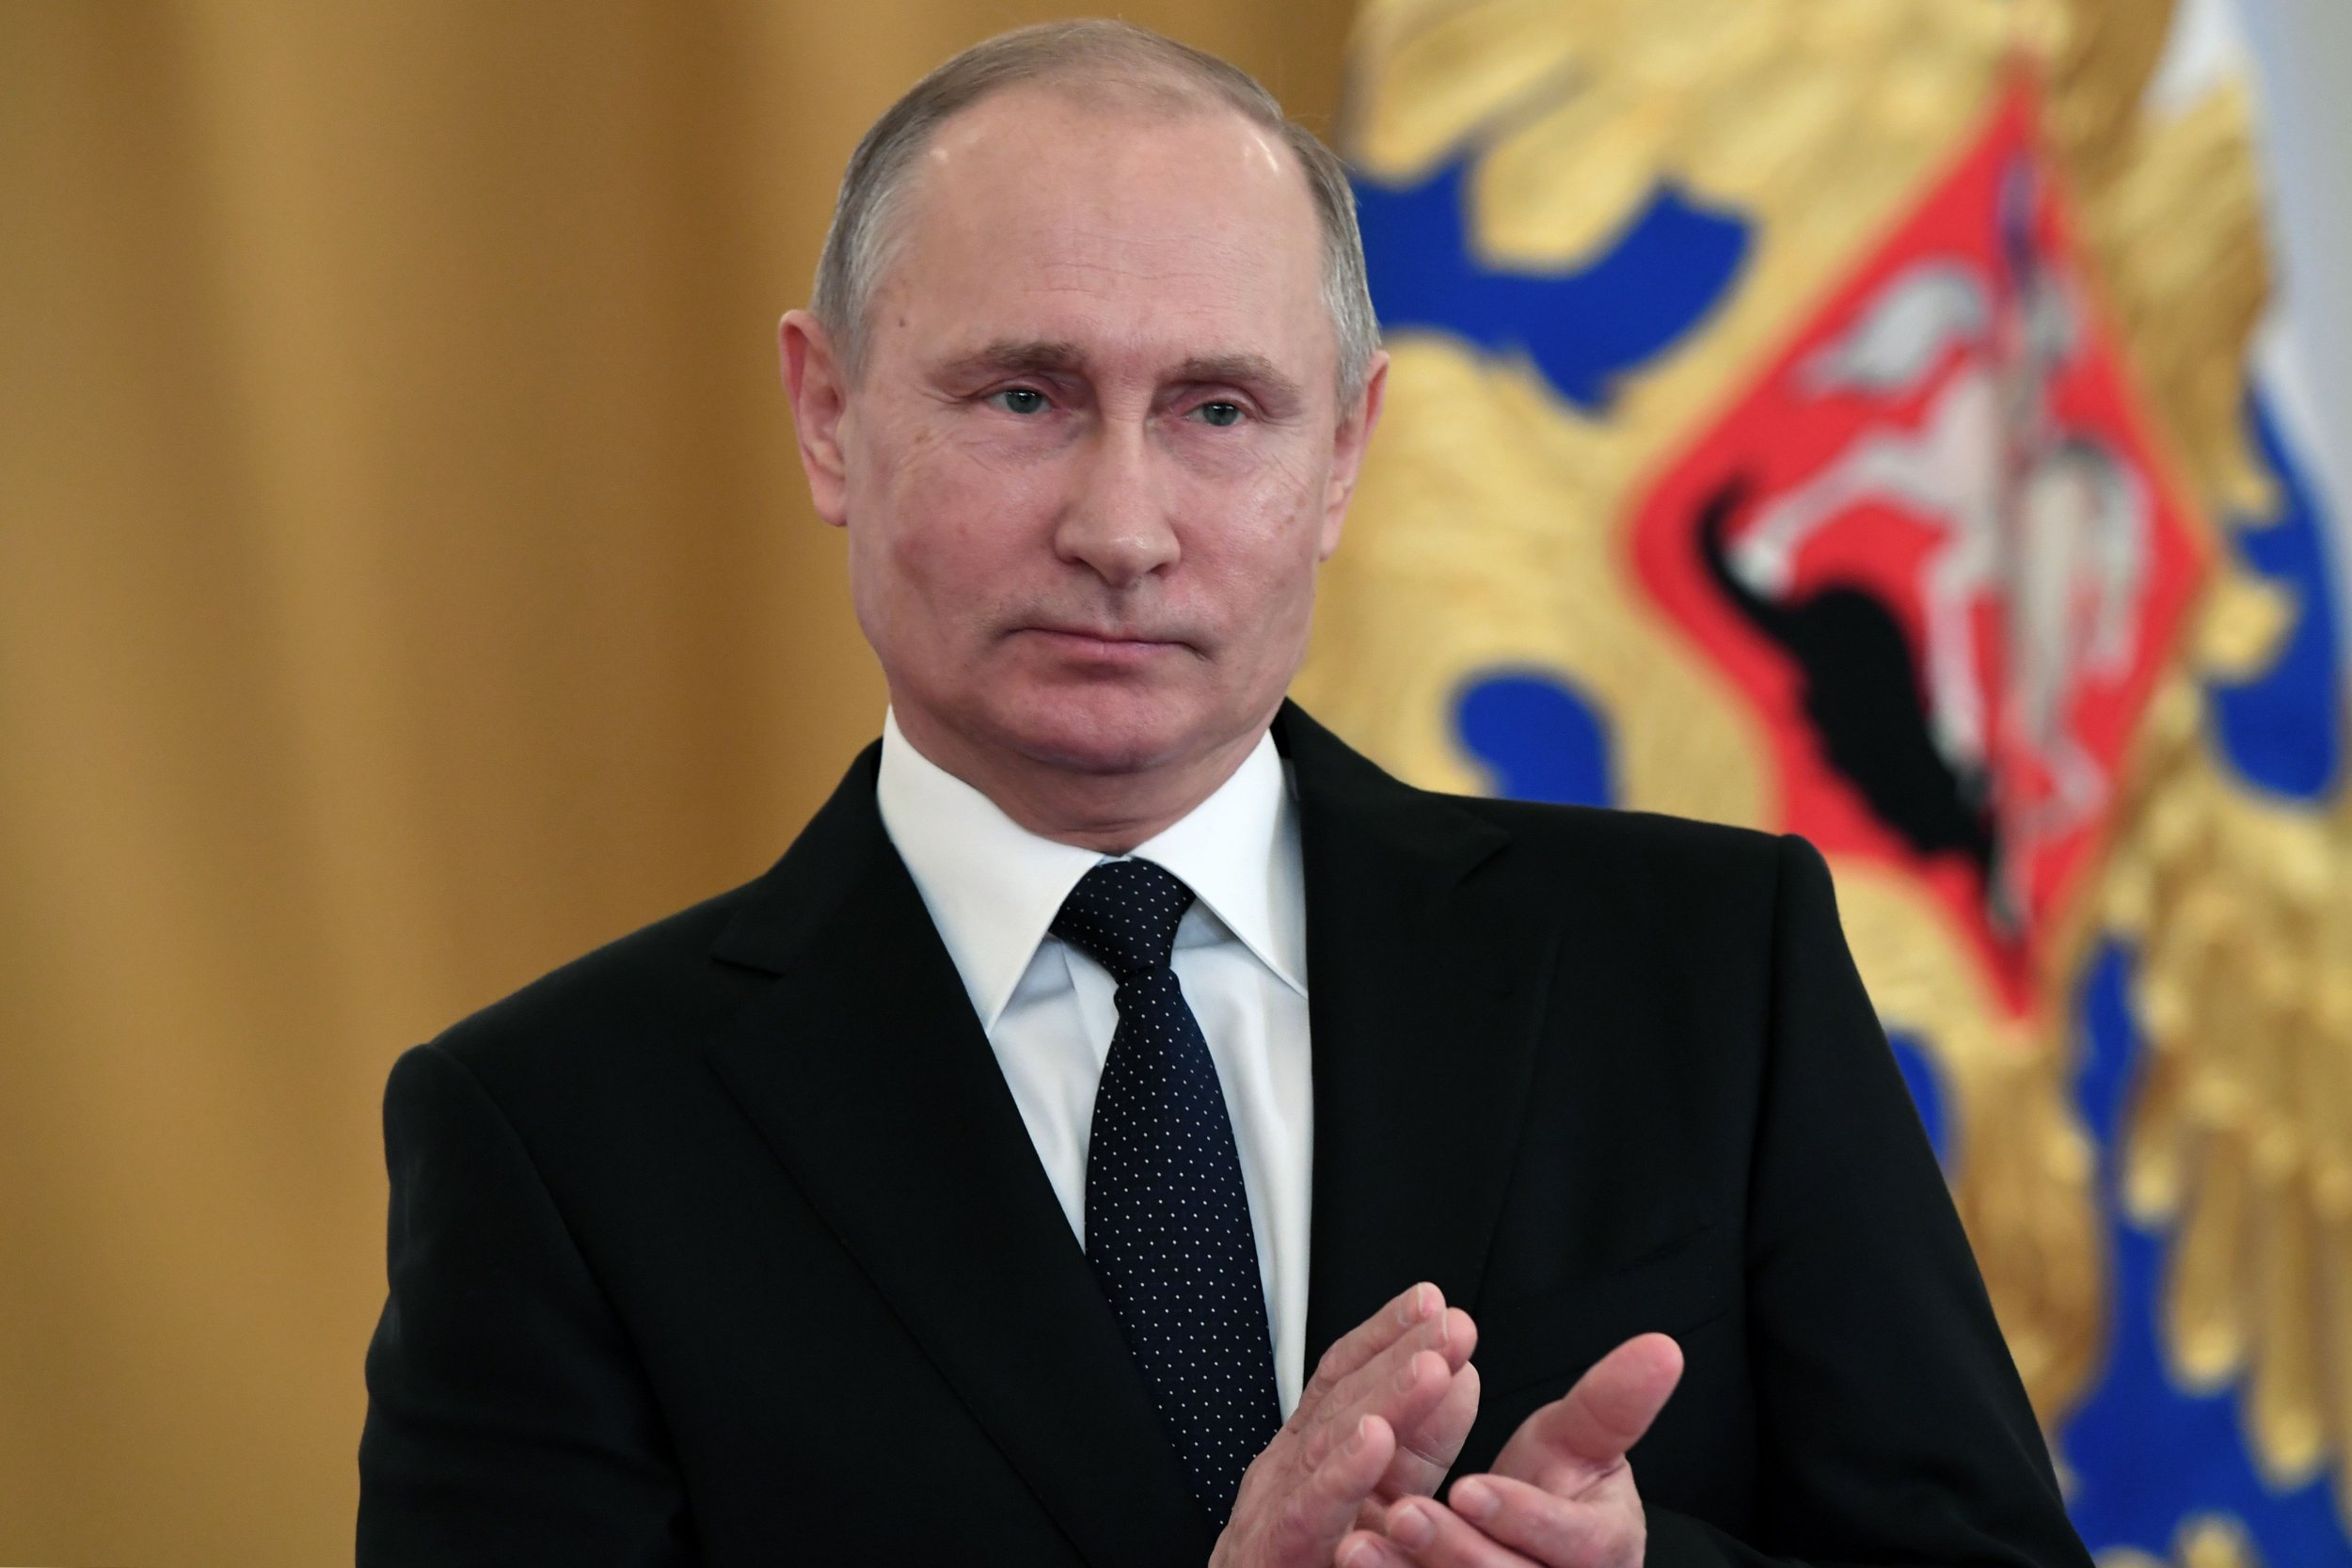 "Putin says ""shrewd"" Kim Jong Un has outwitted Trump in nuclear standoff between North Korea, U.S."